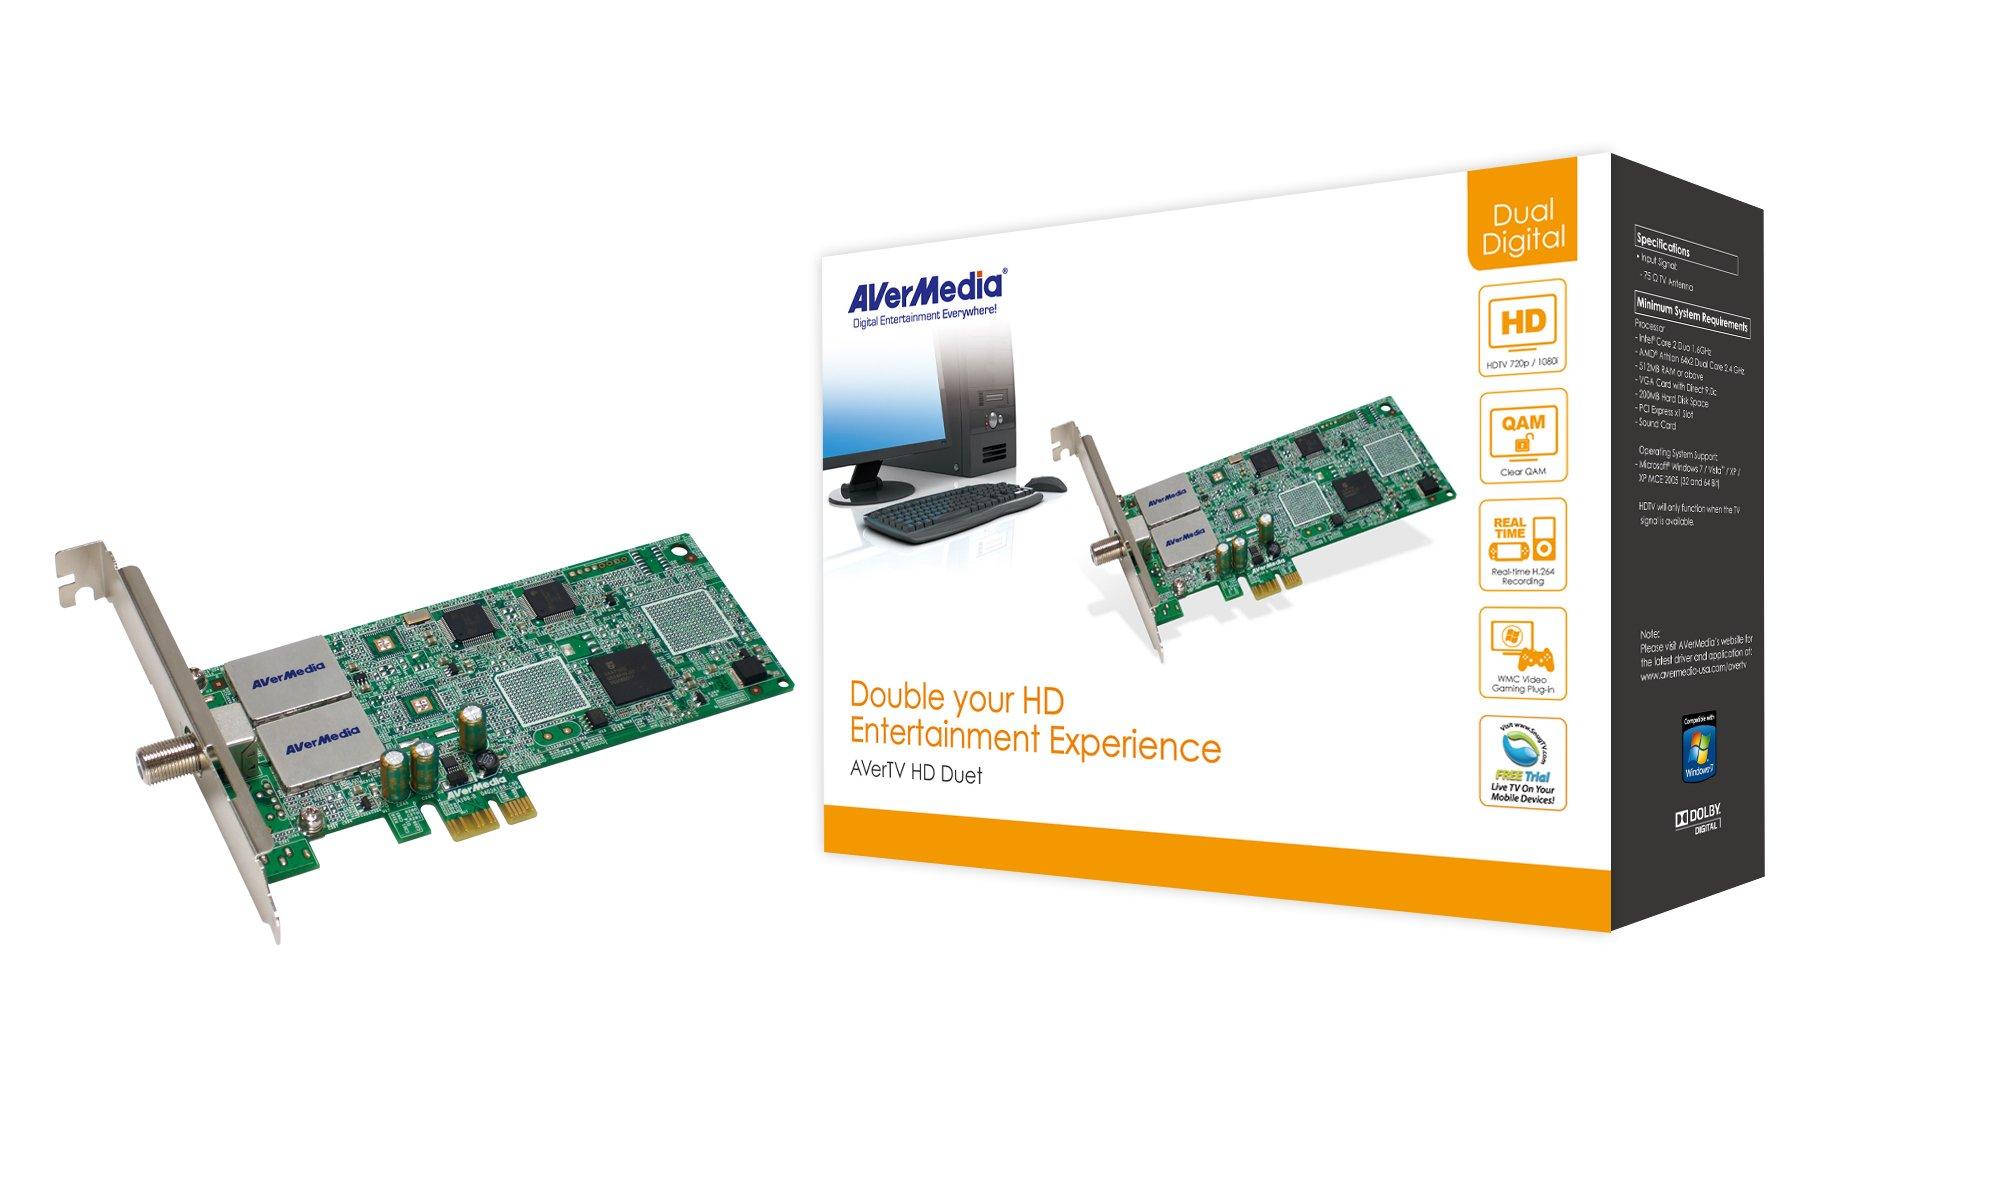 AVerMedia A188 HD Duet - Dual ATSC PCI-E TV Tuner for Windows Media Center by AVerMedia